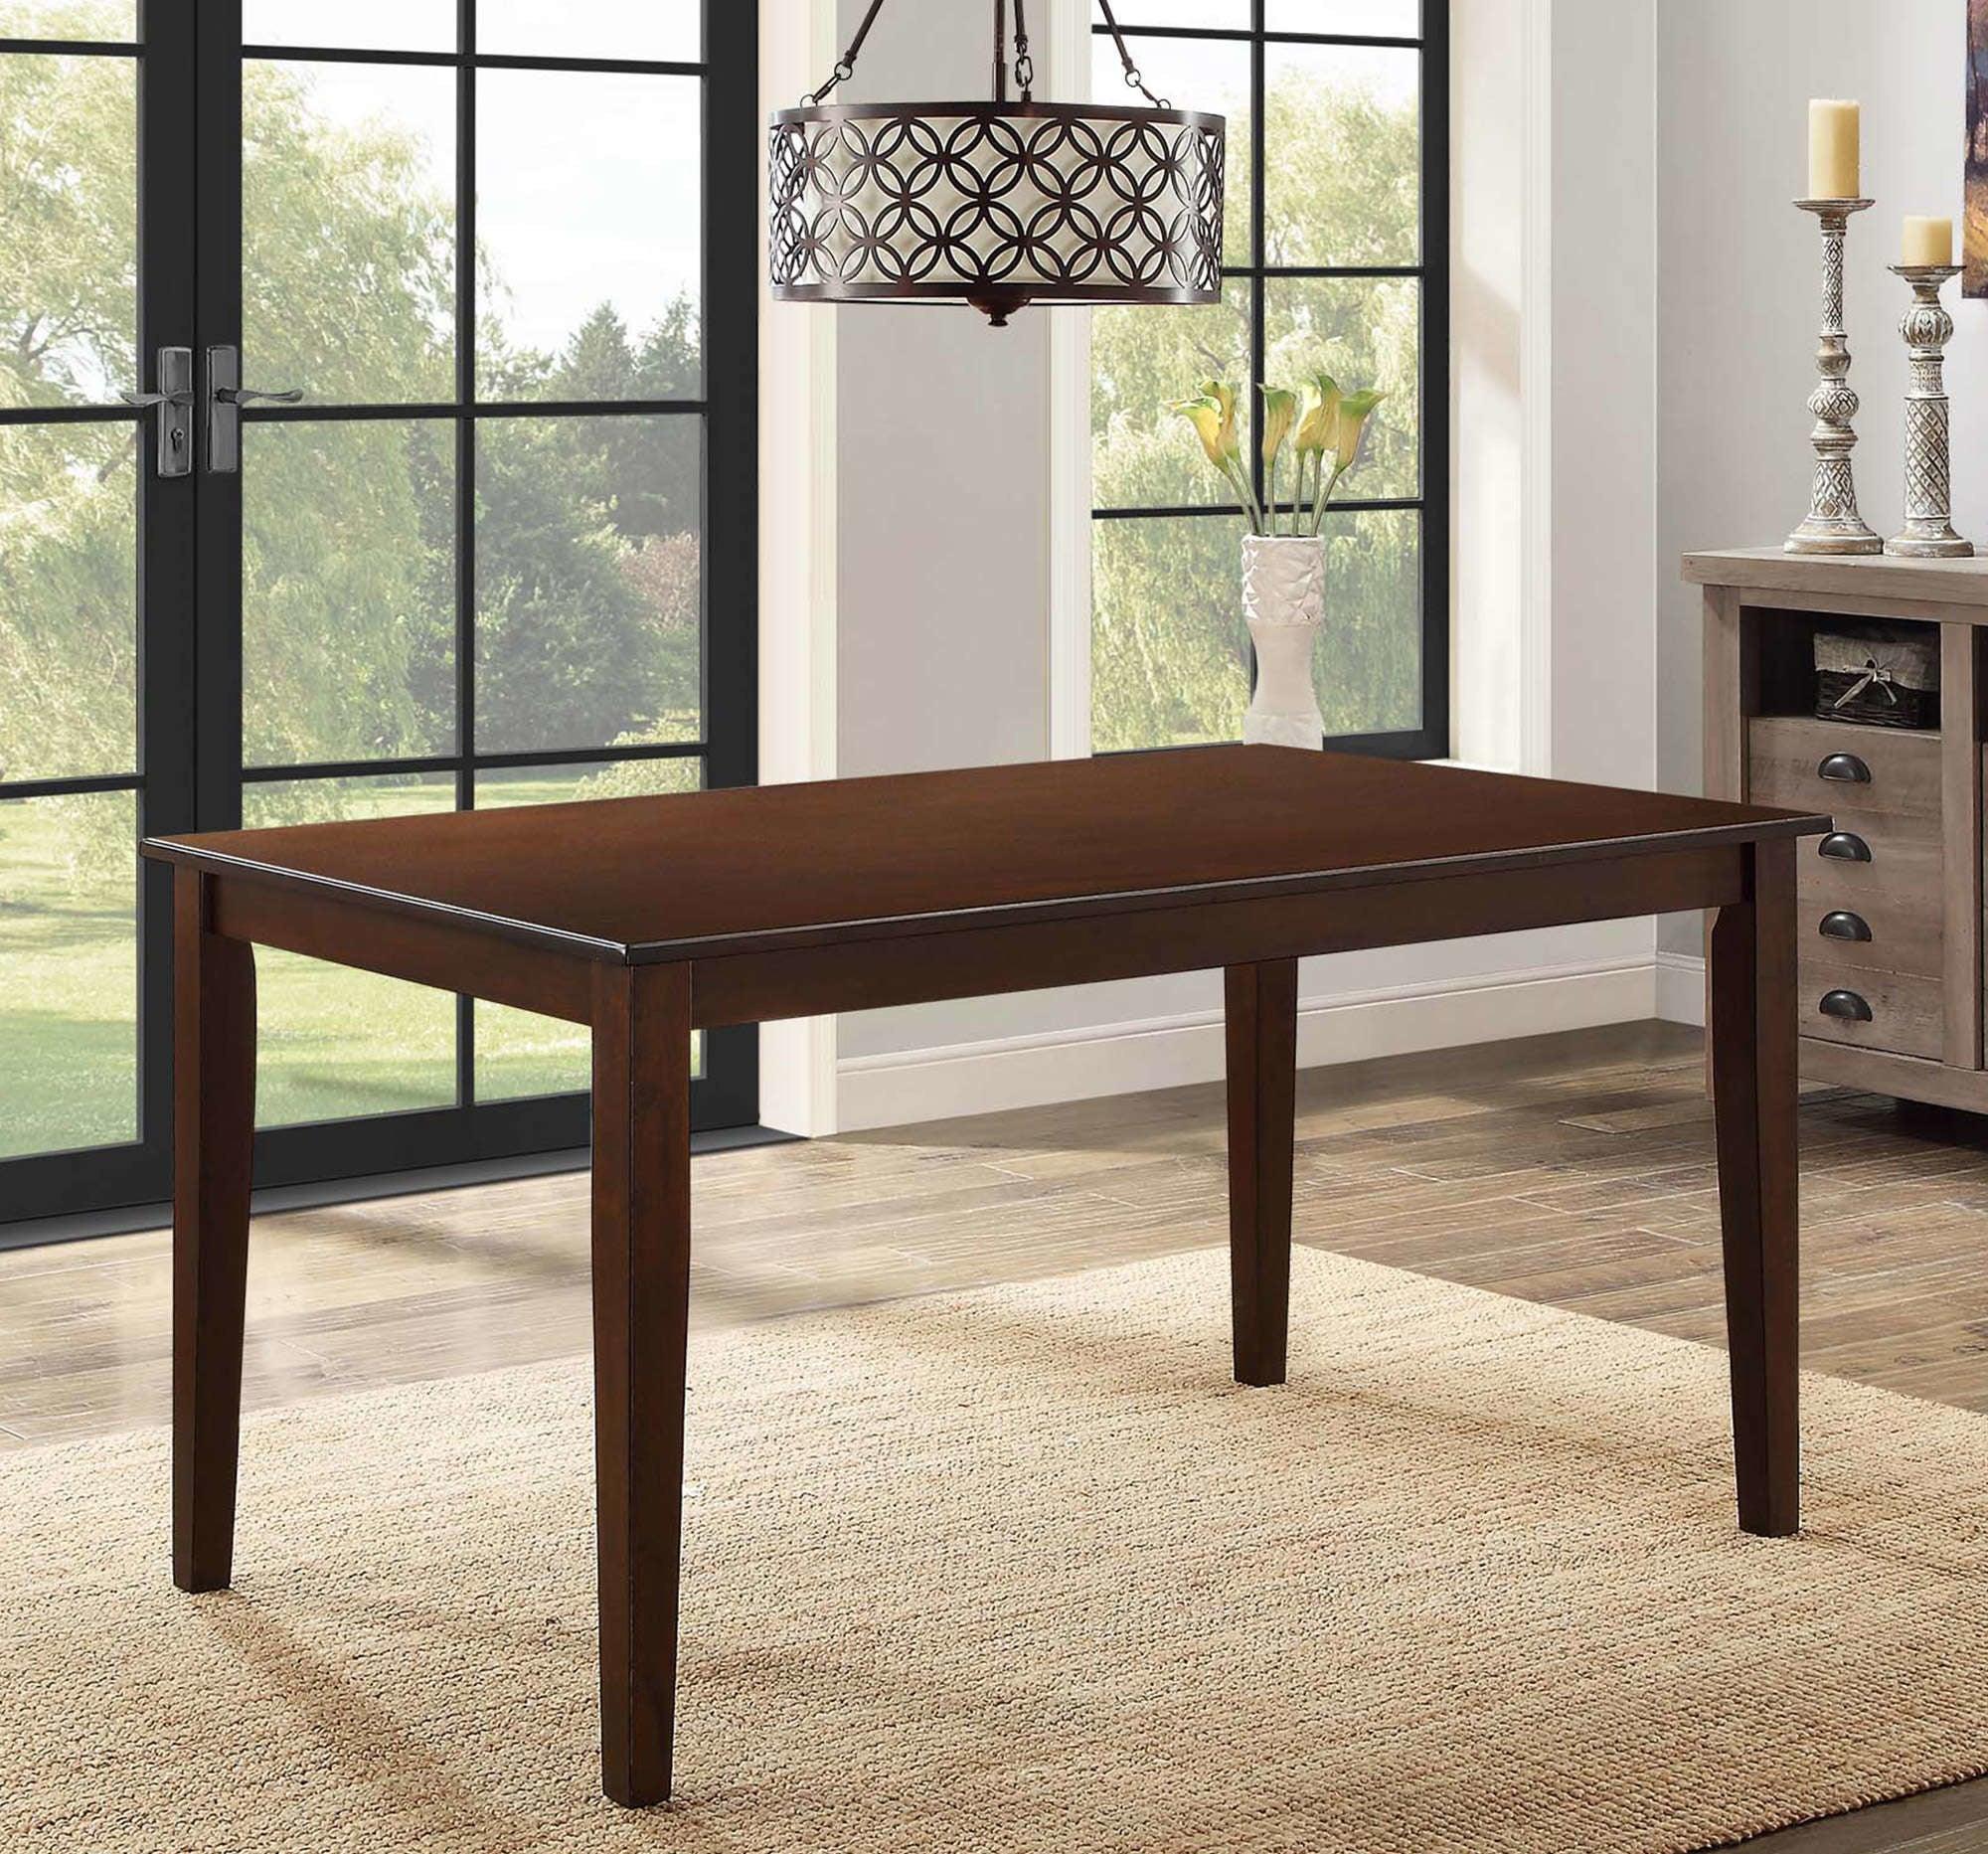 a dark brown table